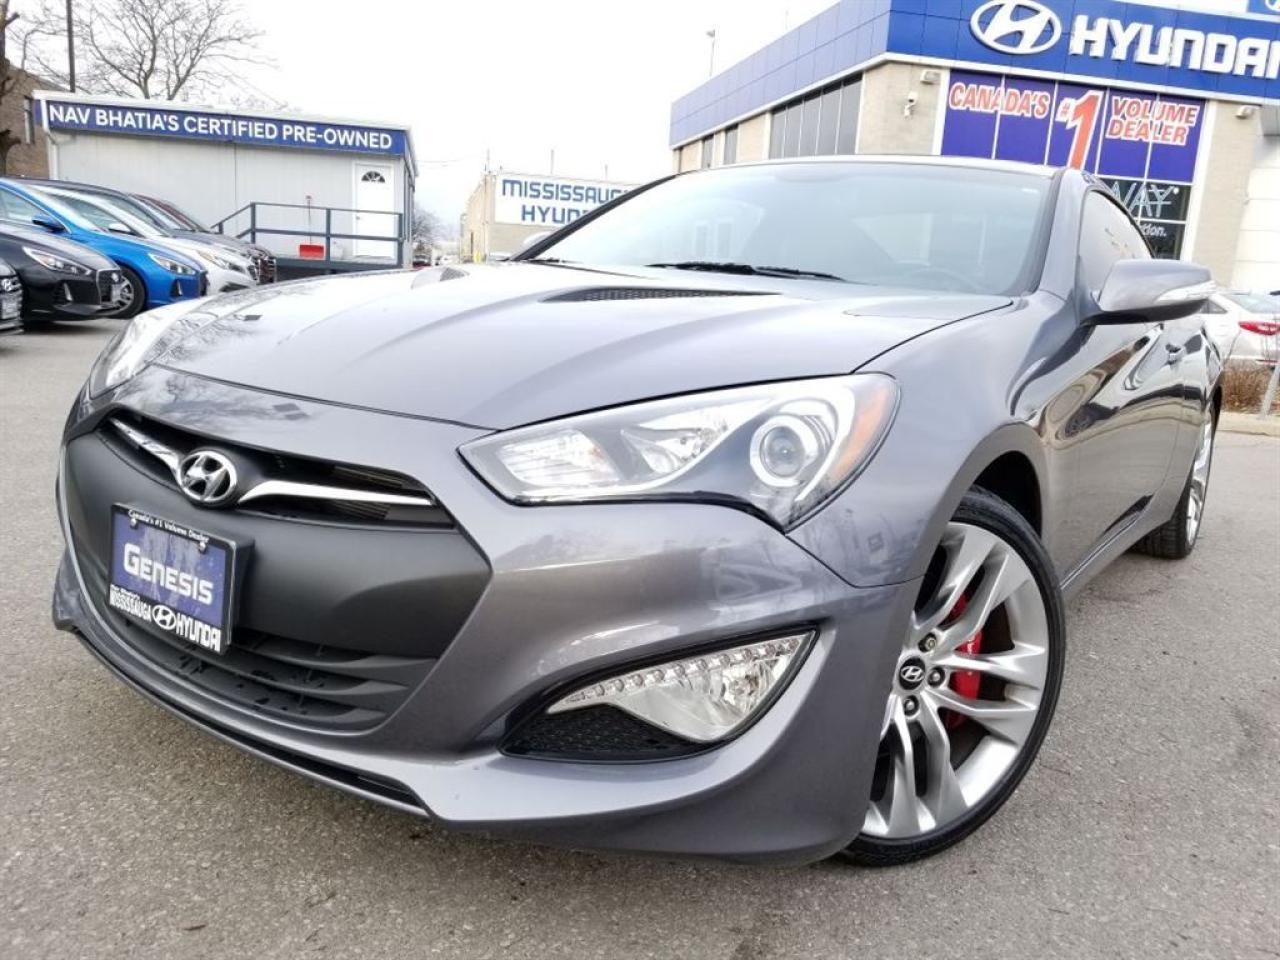 Photo of Grey 2015 Hyundai Genesis